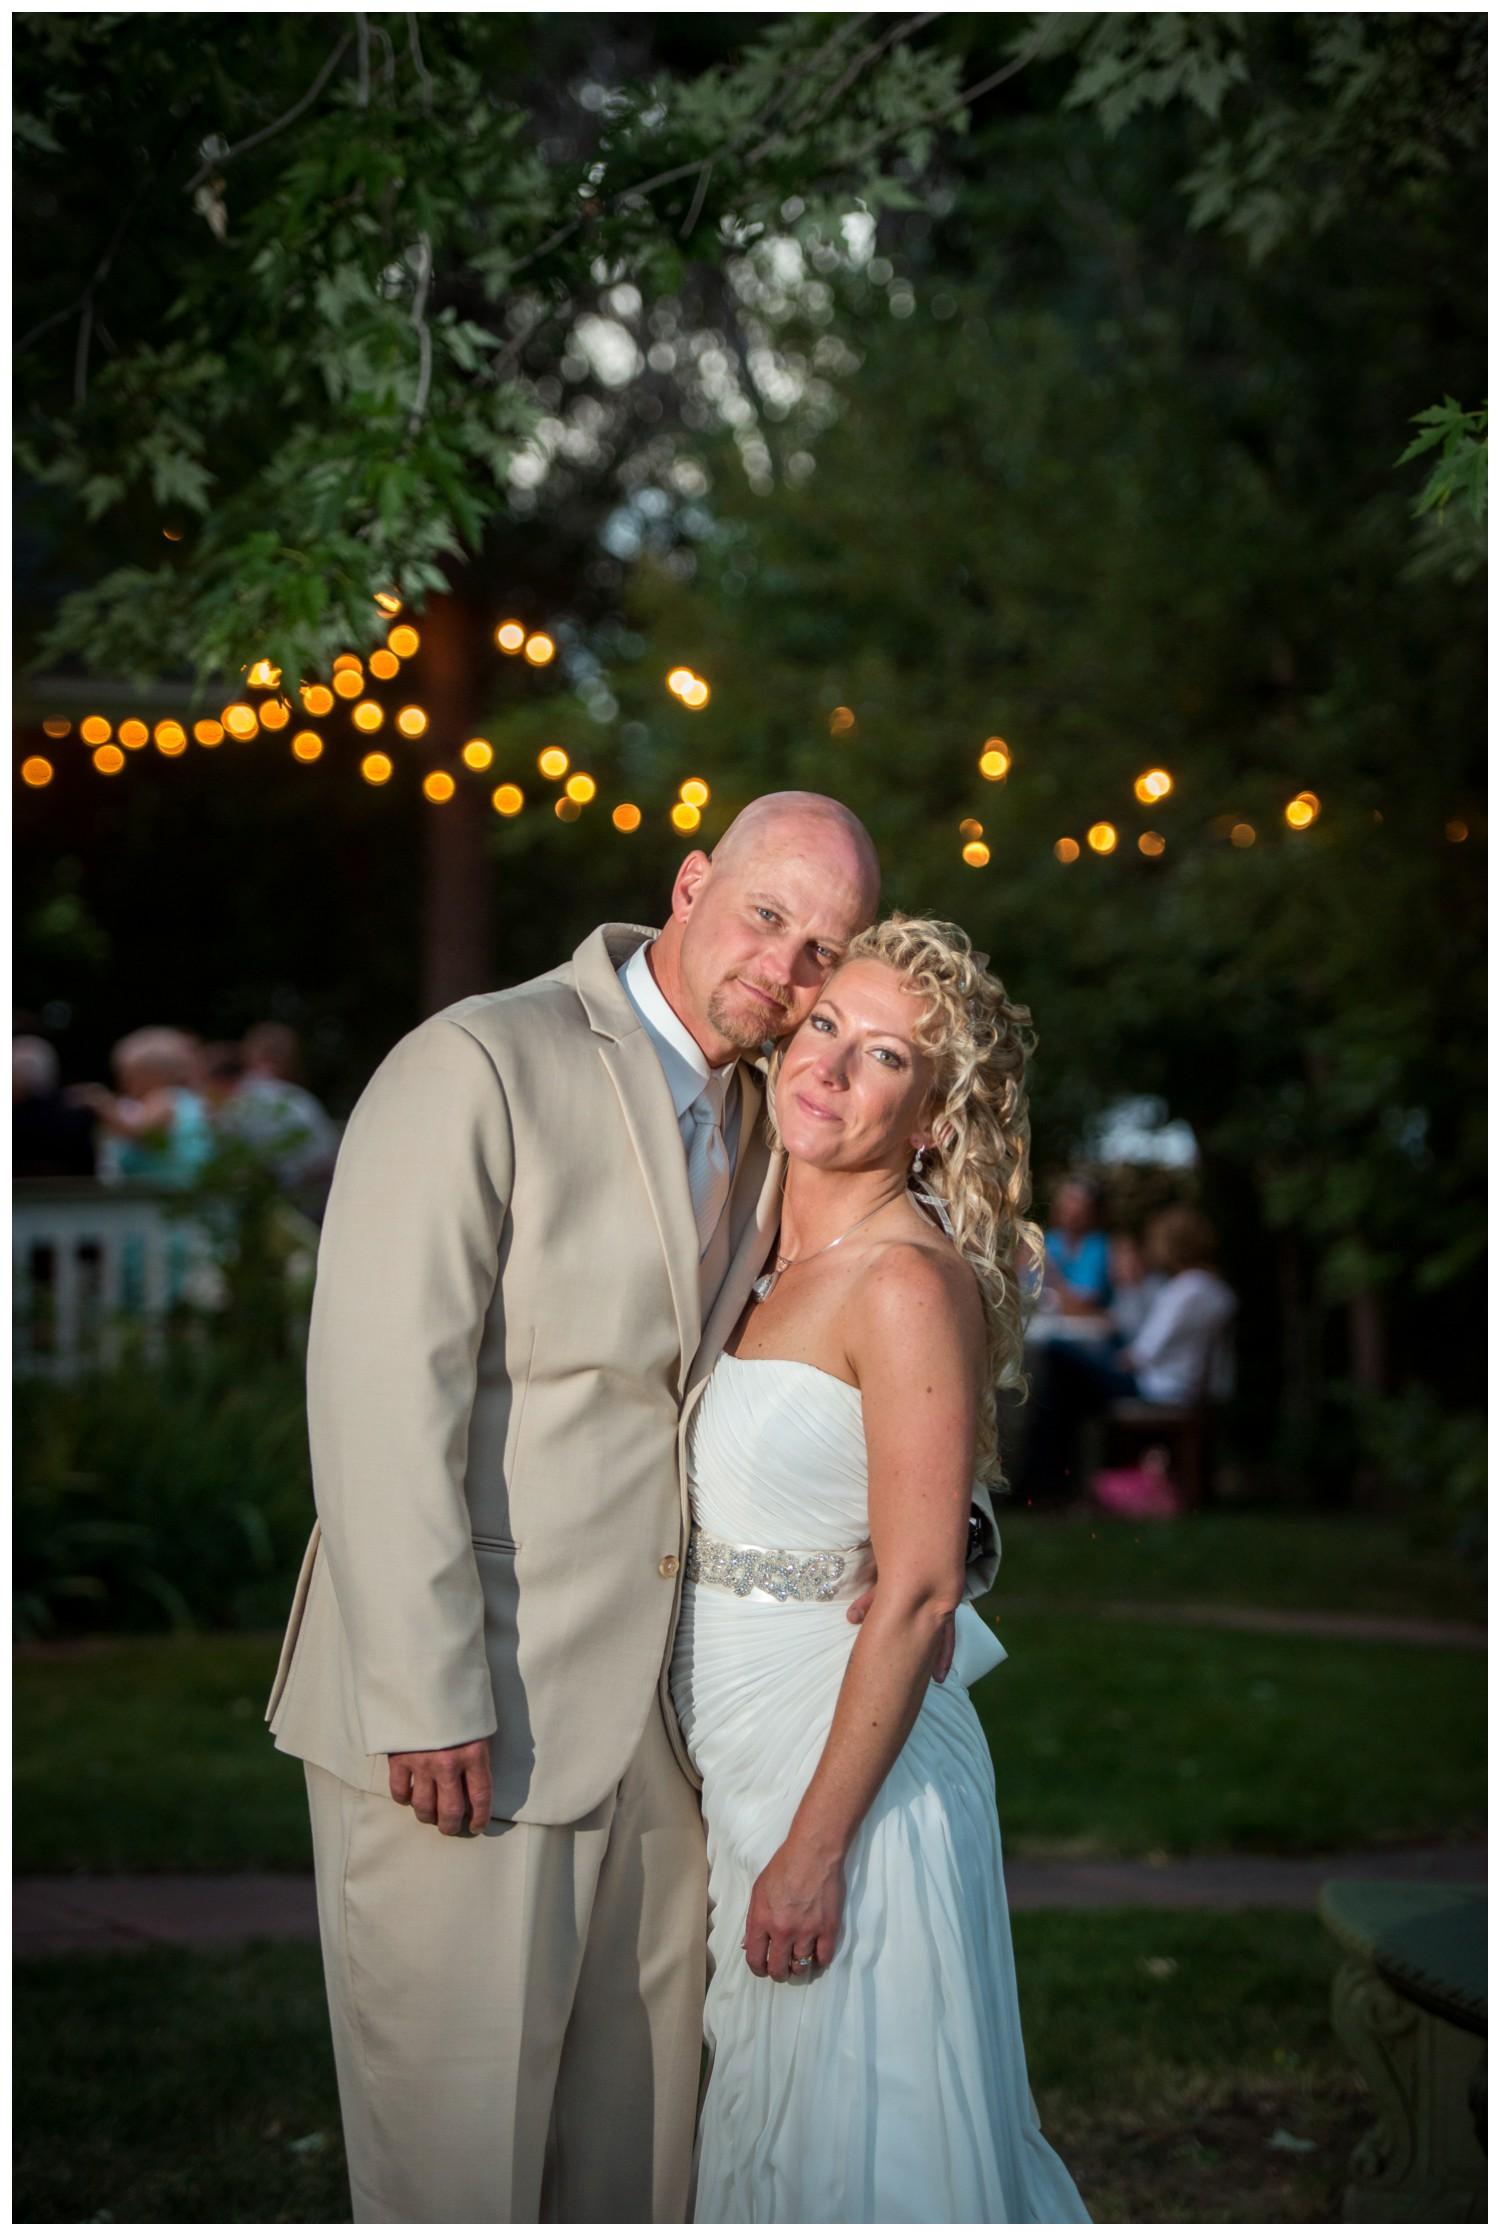 Morningside-manor-colorado-outdoor-wedding-photography_0058.jpg